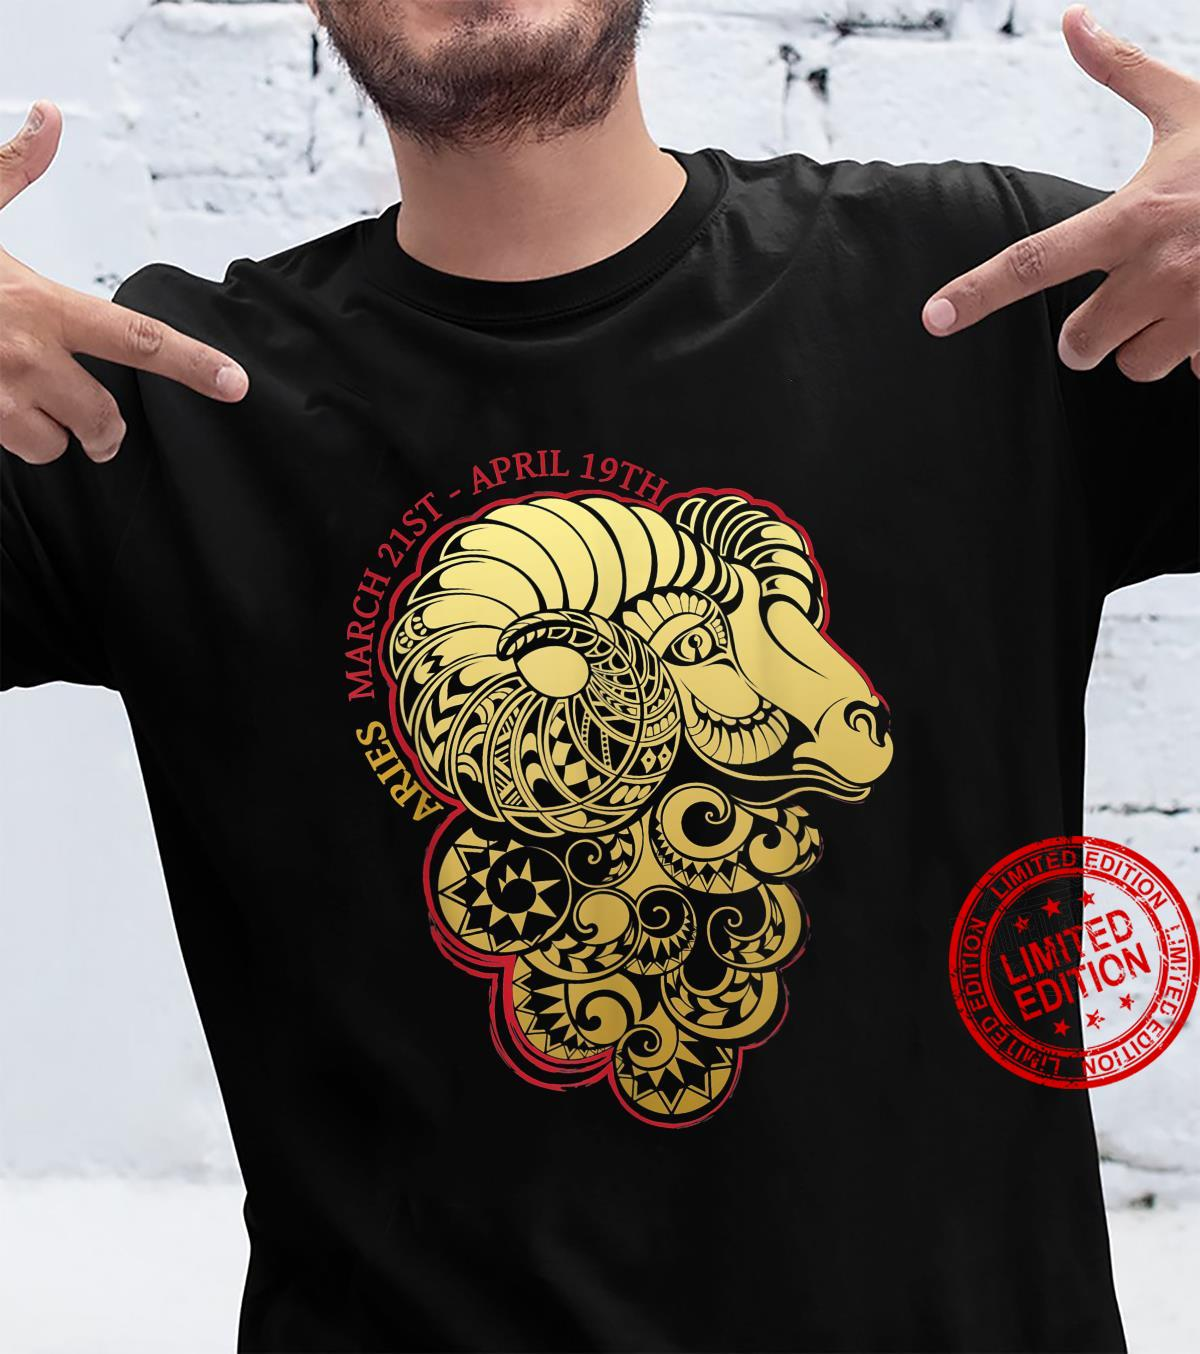 Aries The Ram Zodiac Astrology Horoscope Shirt